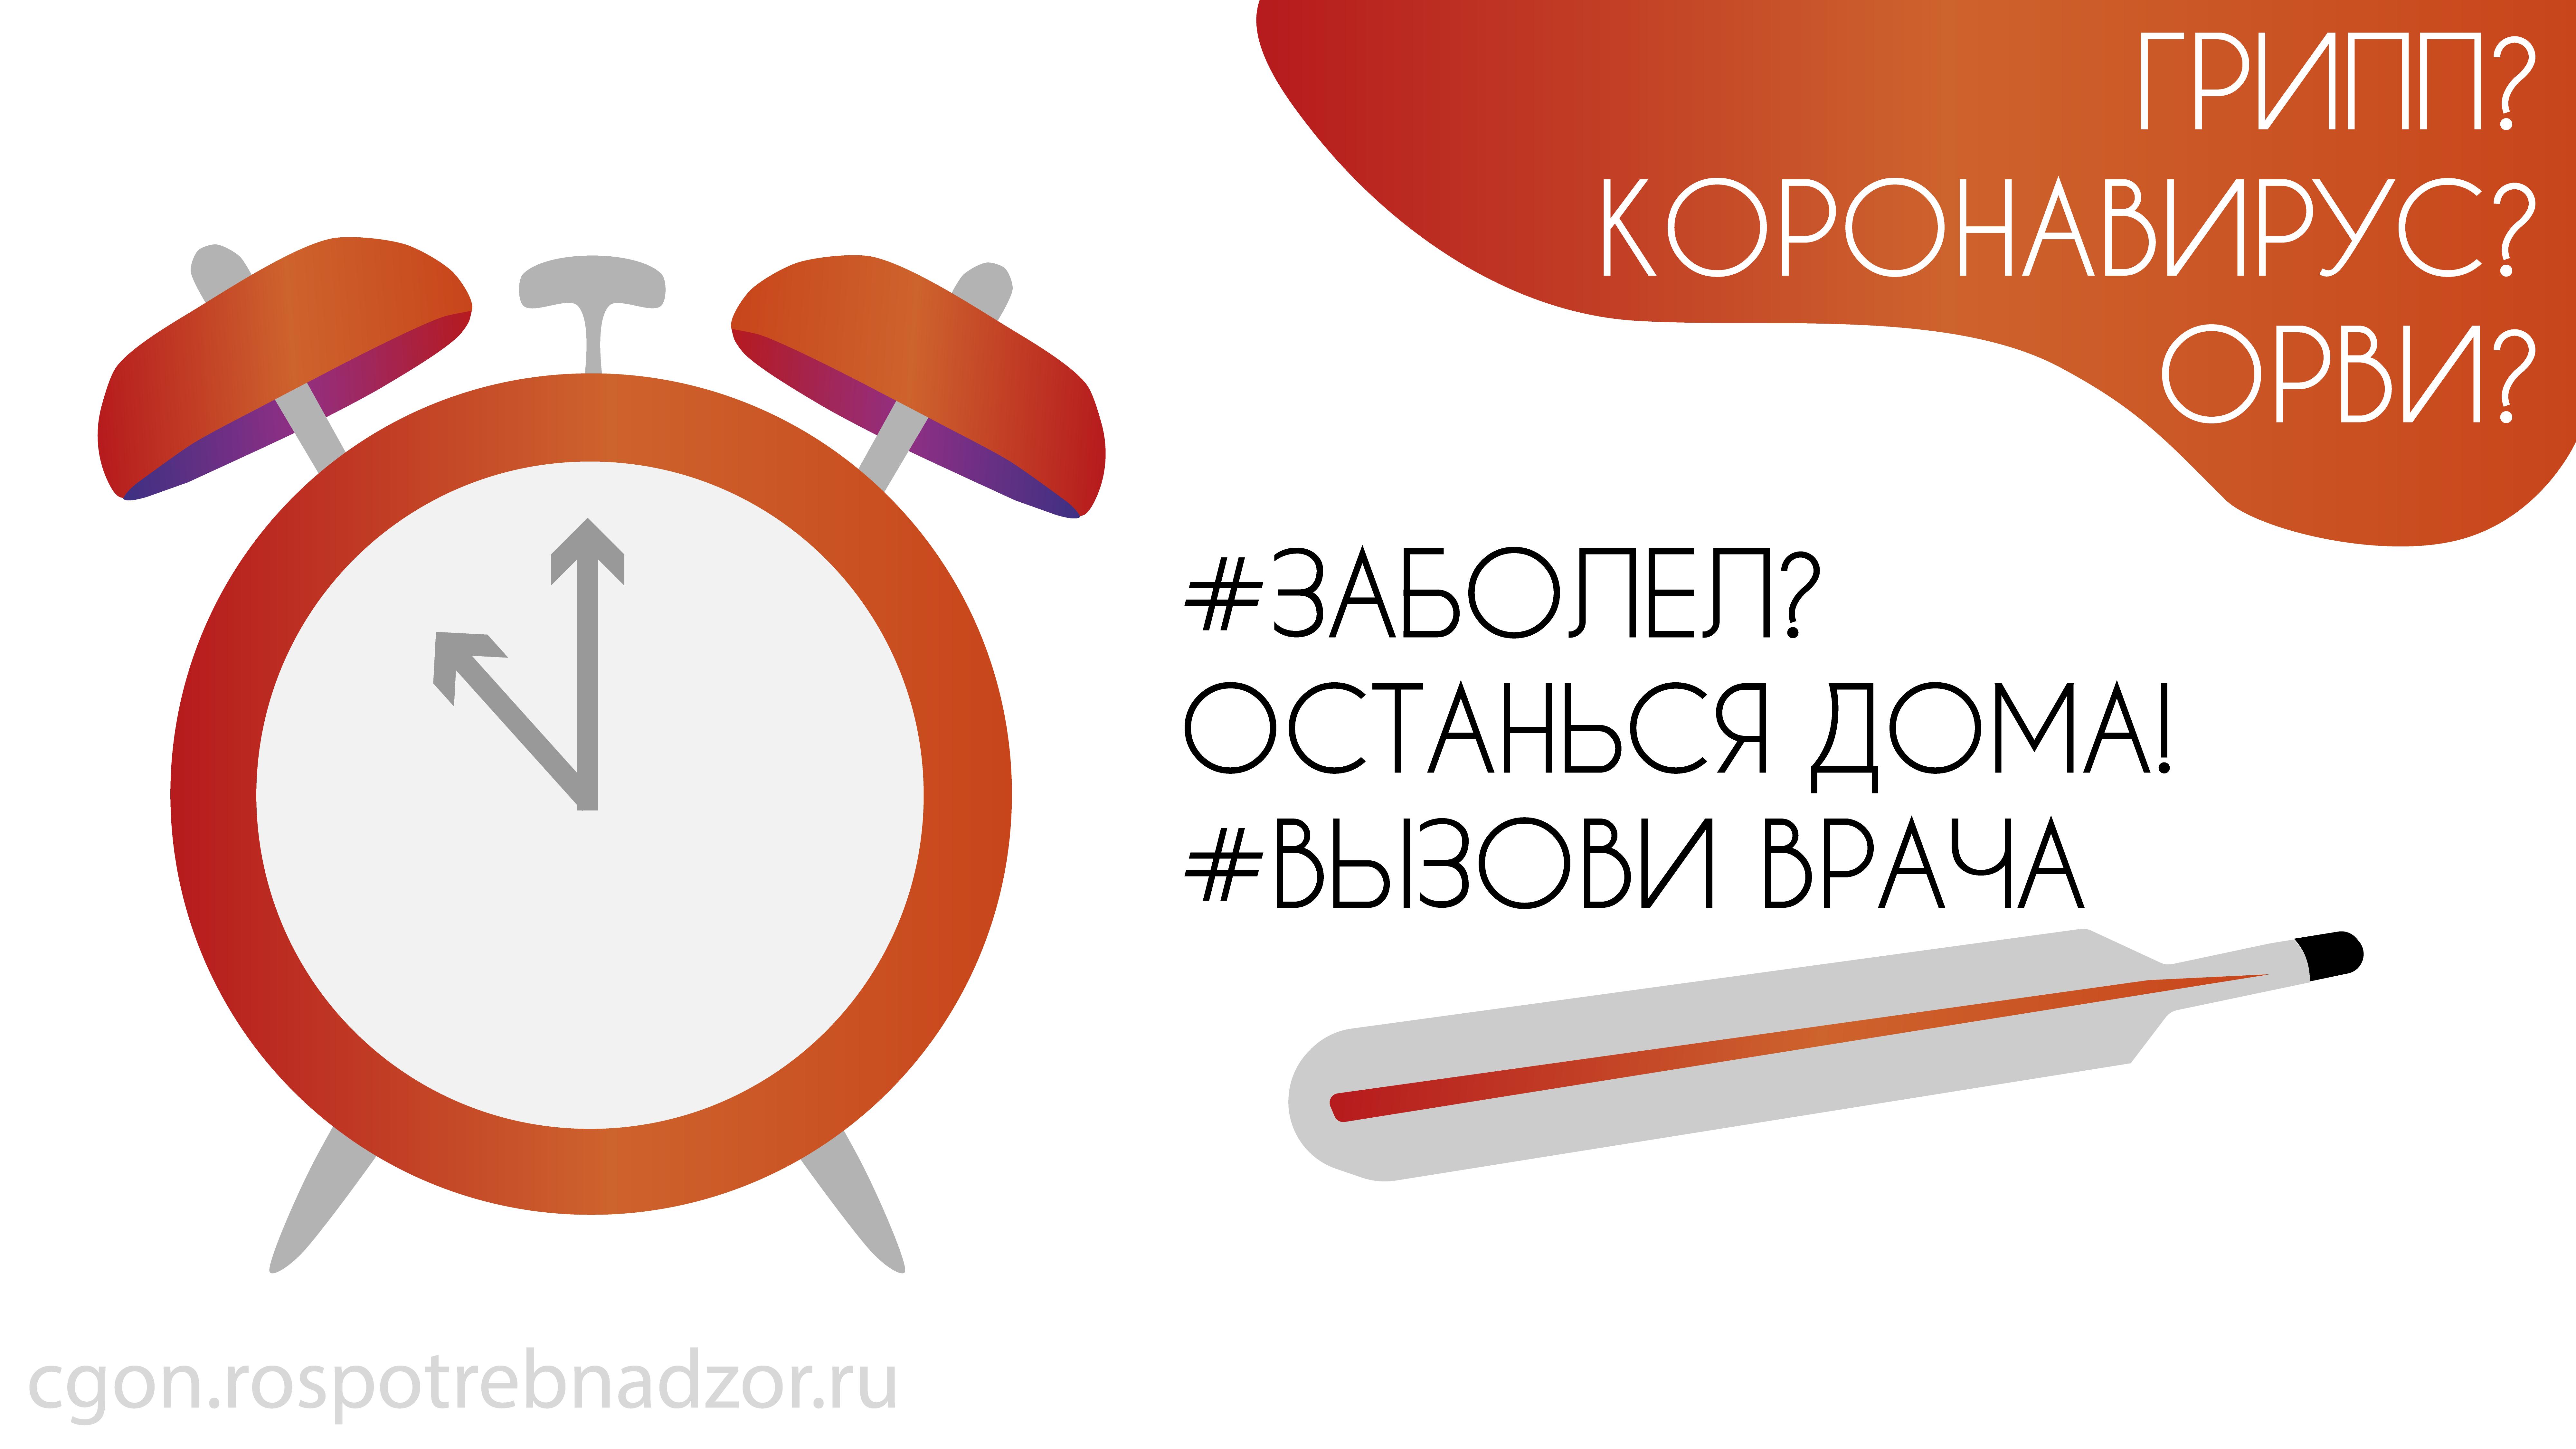 Источник: https://www.rospotrebnadzor.ru/